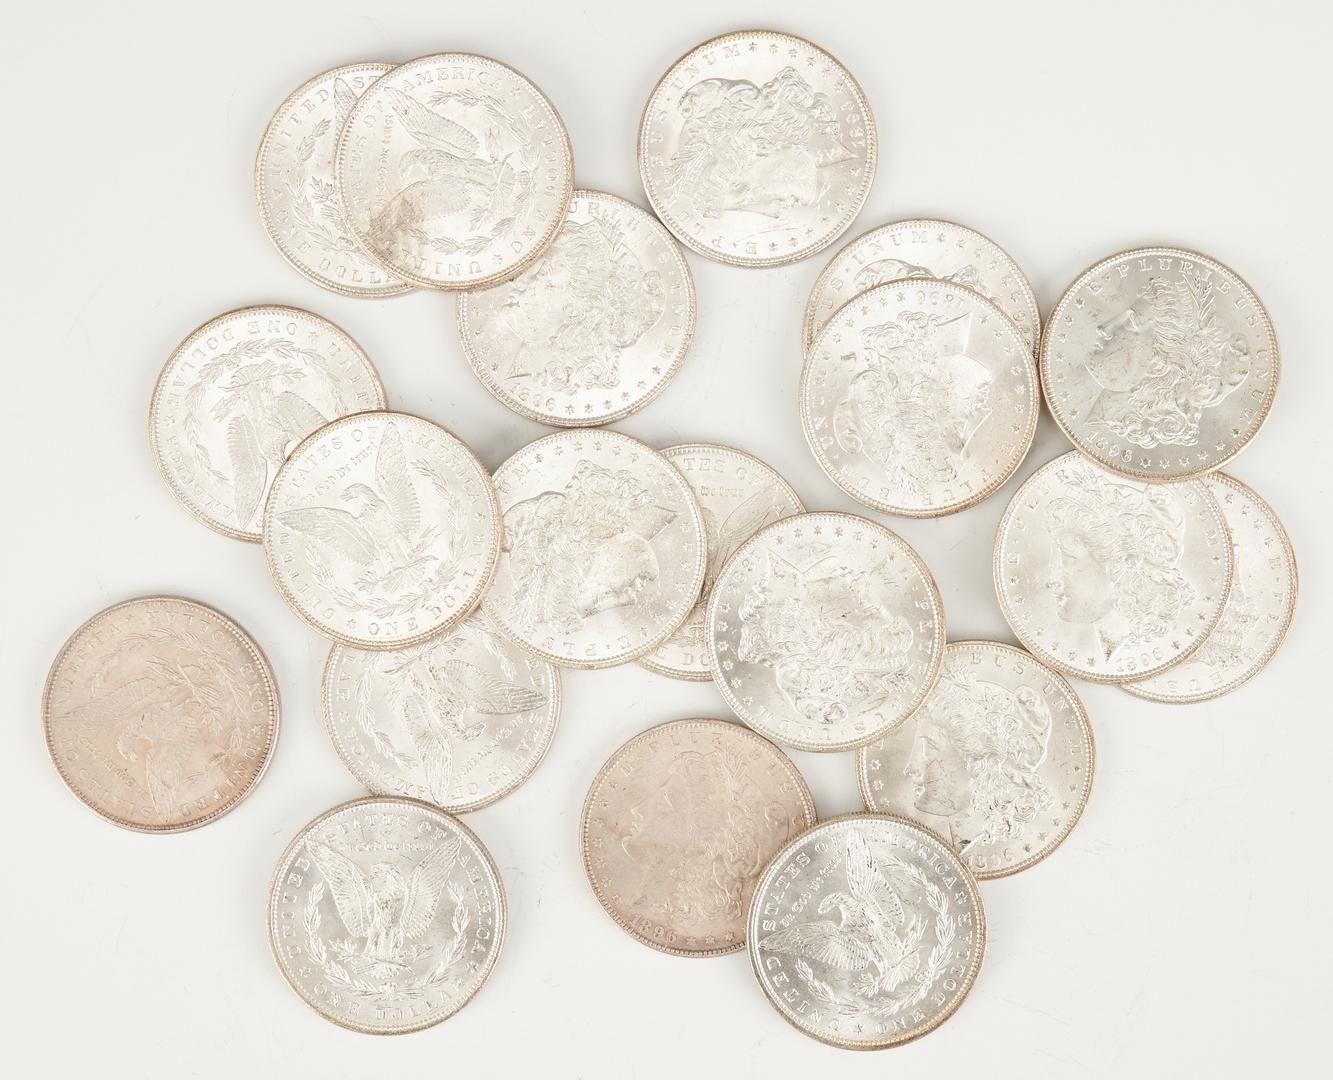 Lot 743: UNC Roll of Morgan Silver Dollars, #1, 1896